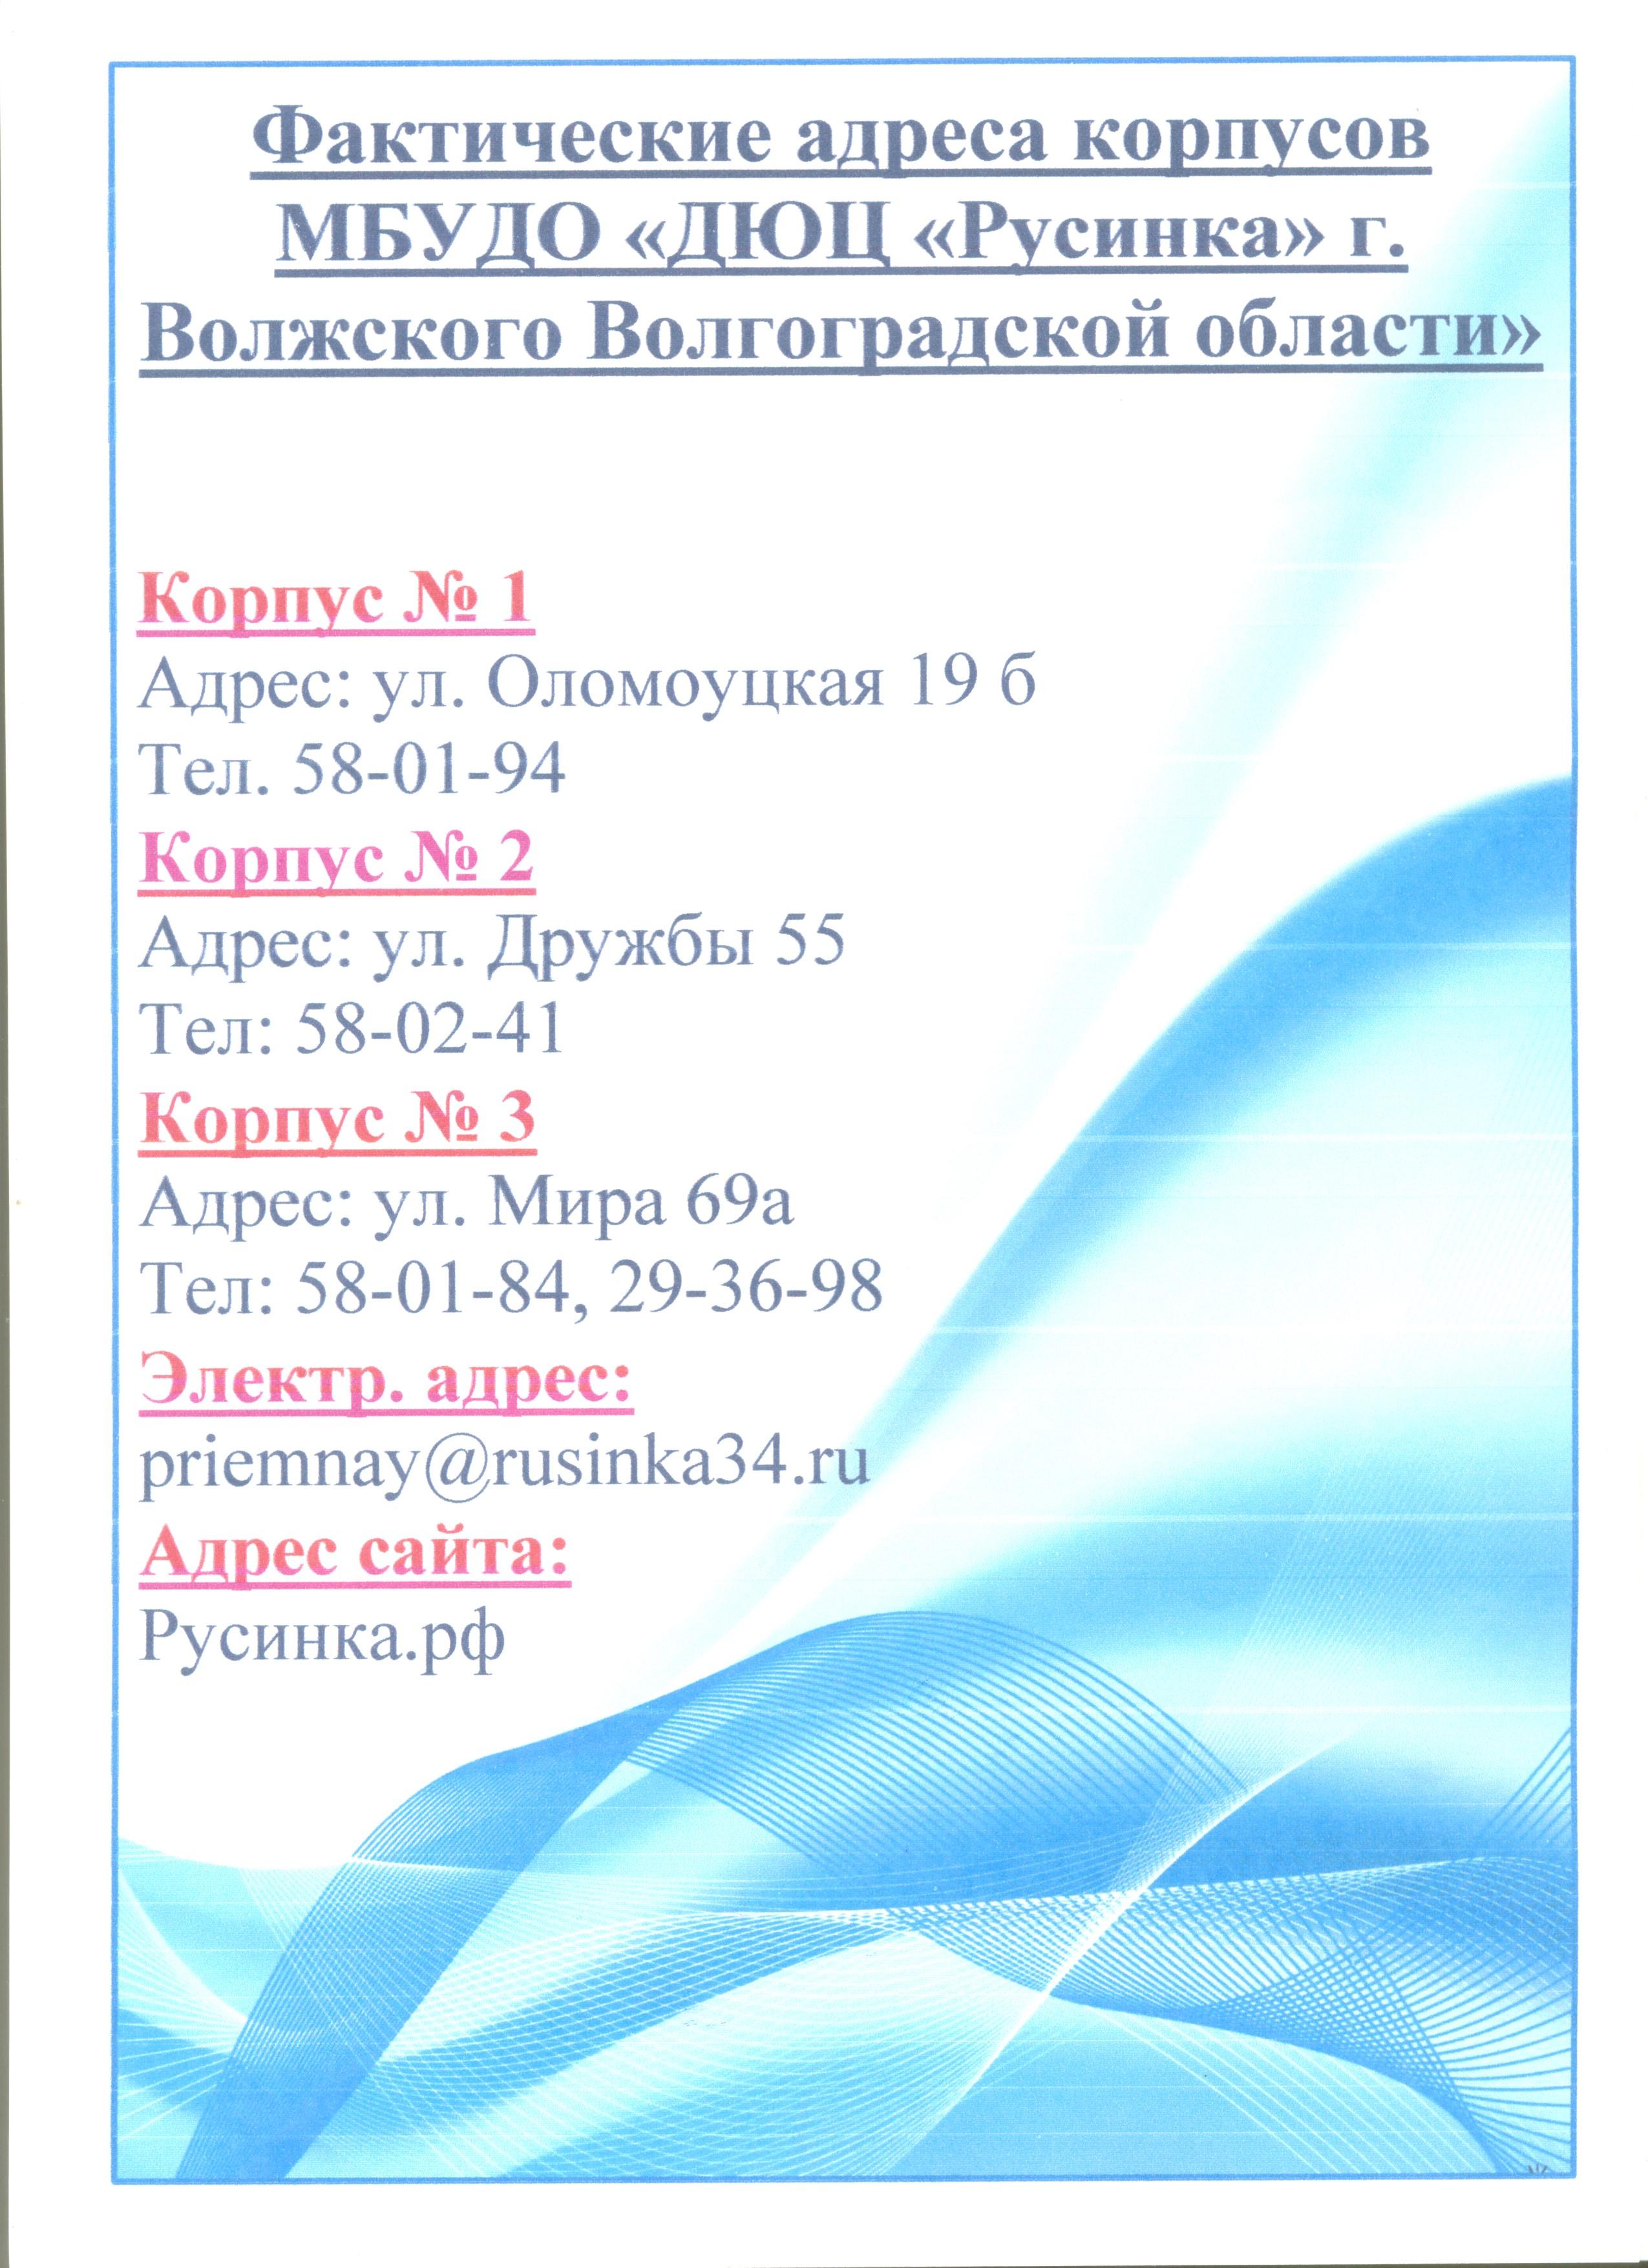 Скан_20170713